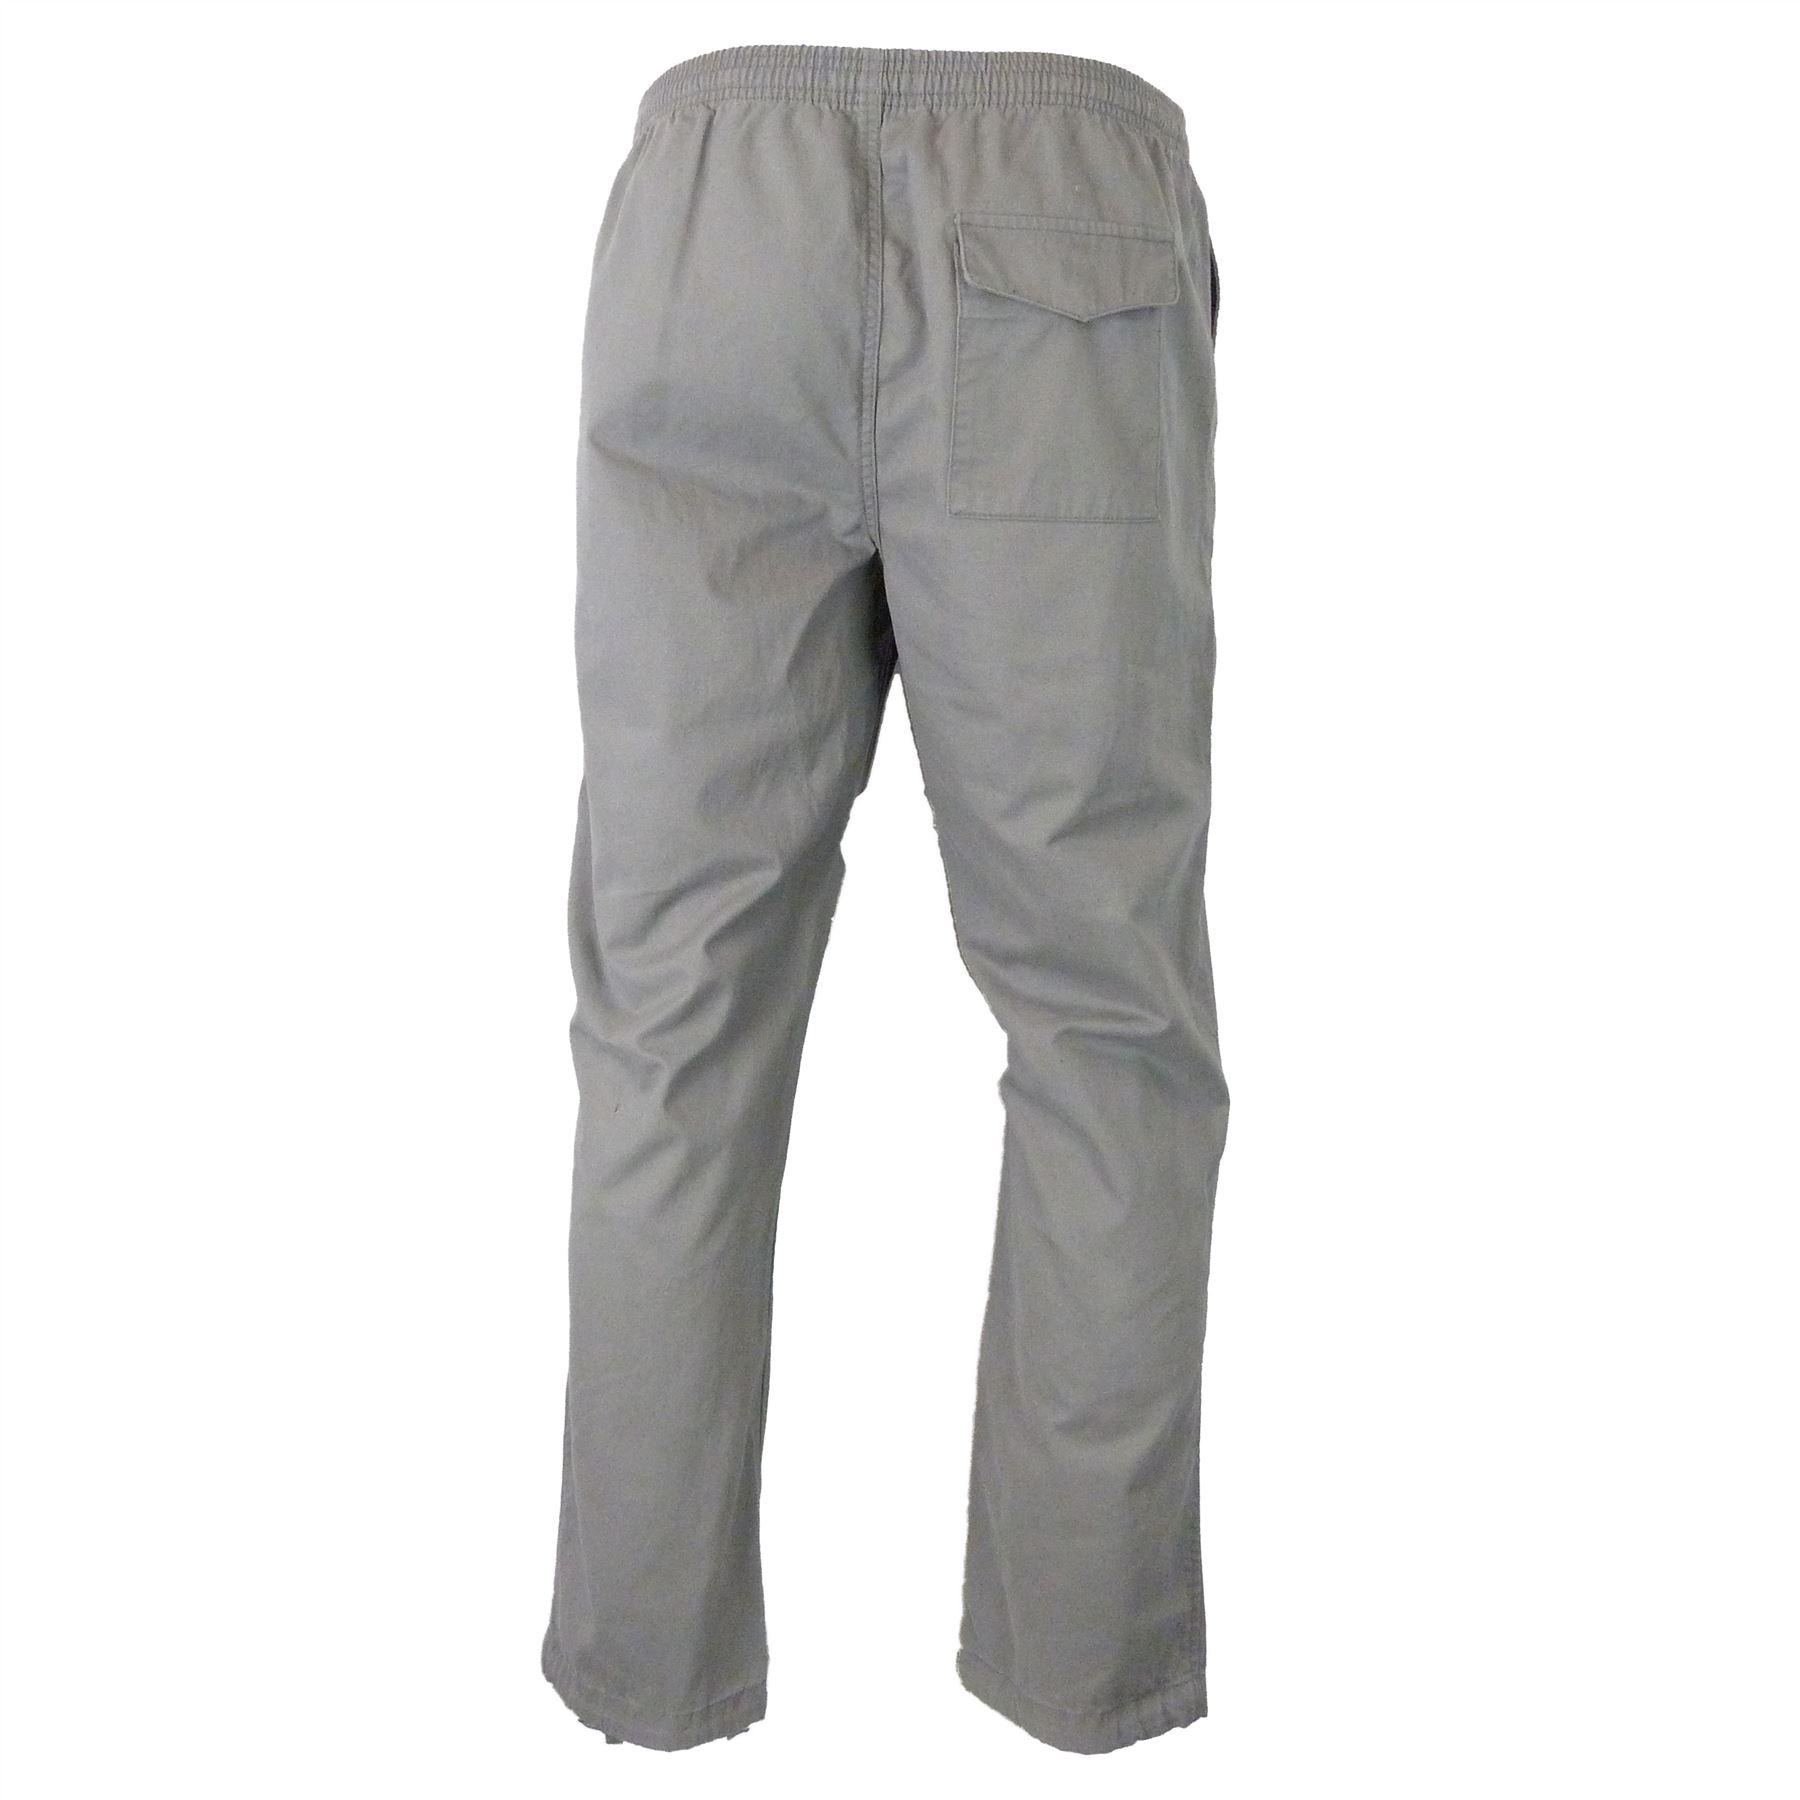 Ex-M-amp-S-Marks-and-Spencer-Coleccion-Regular-Fit-puro-algodon-Chinos-Pantalones miniatura 5